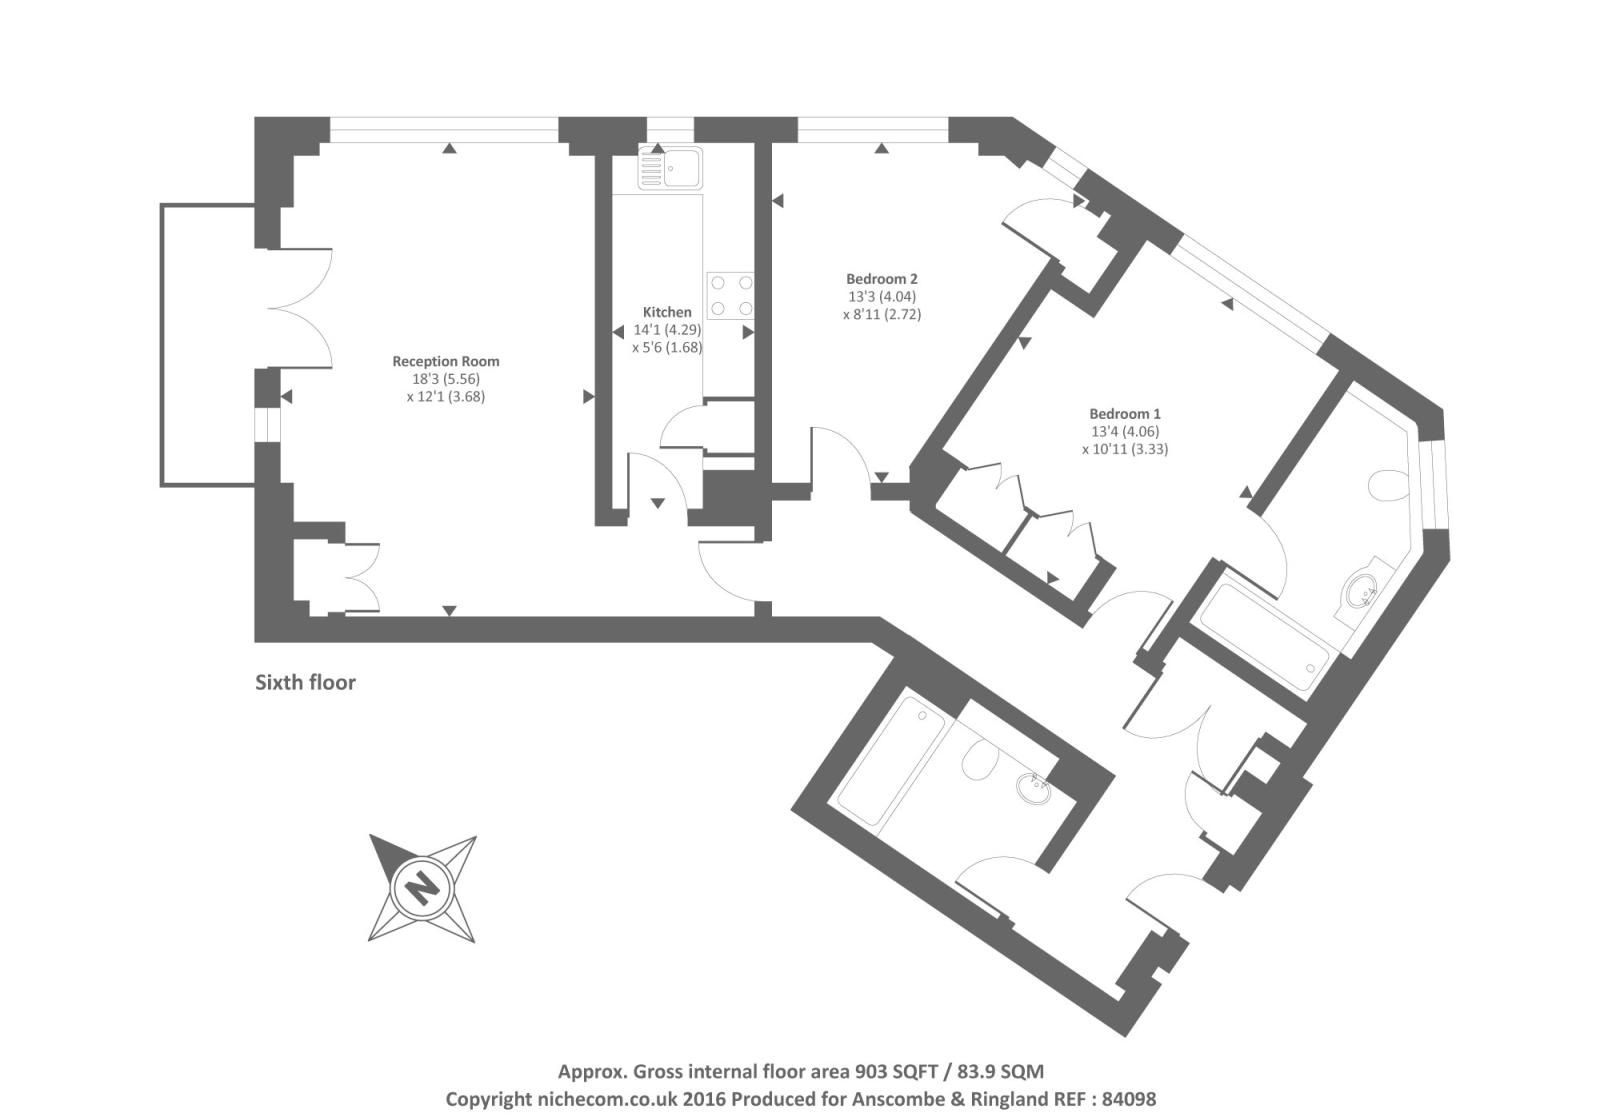 Blazer court st johns wood nw8 2 bedroom flat for sale for 11 brunel crt floor plan